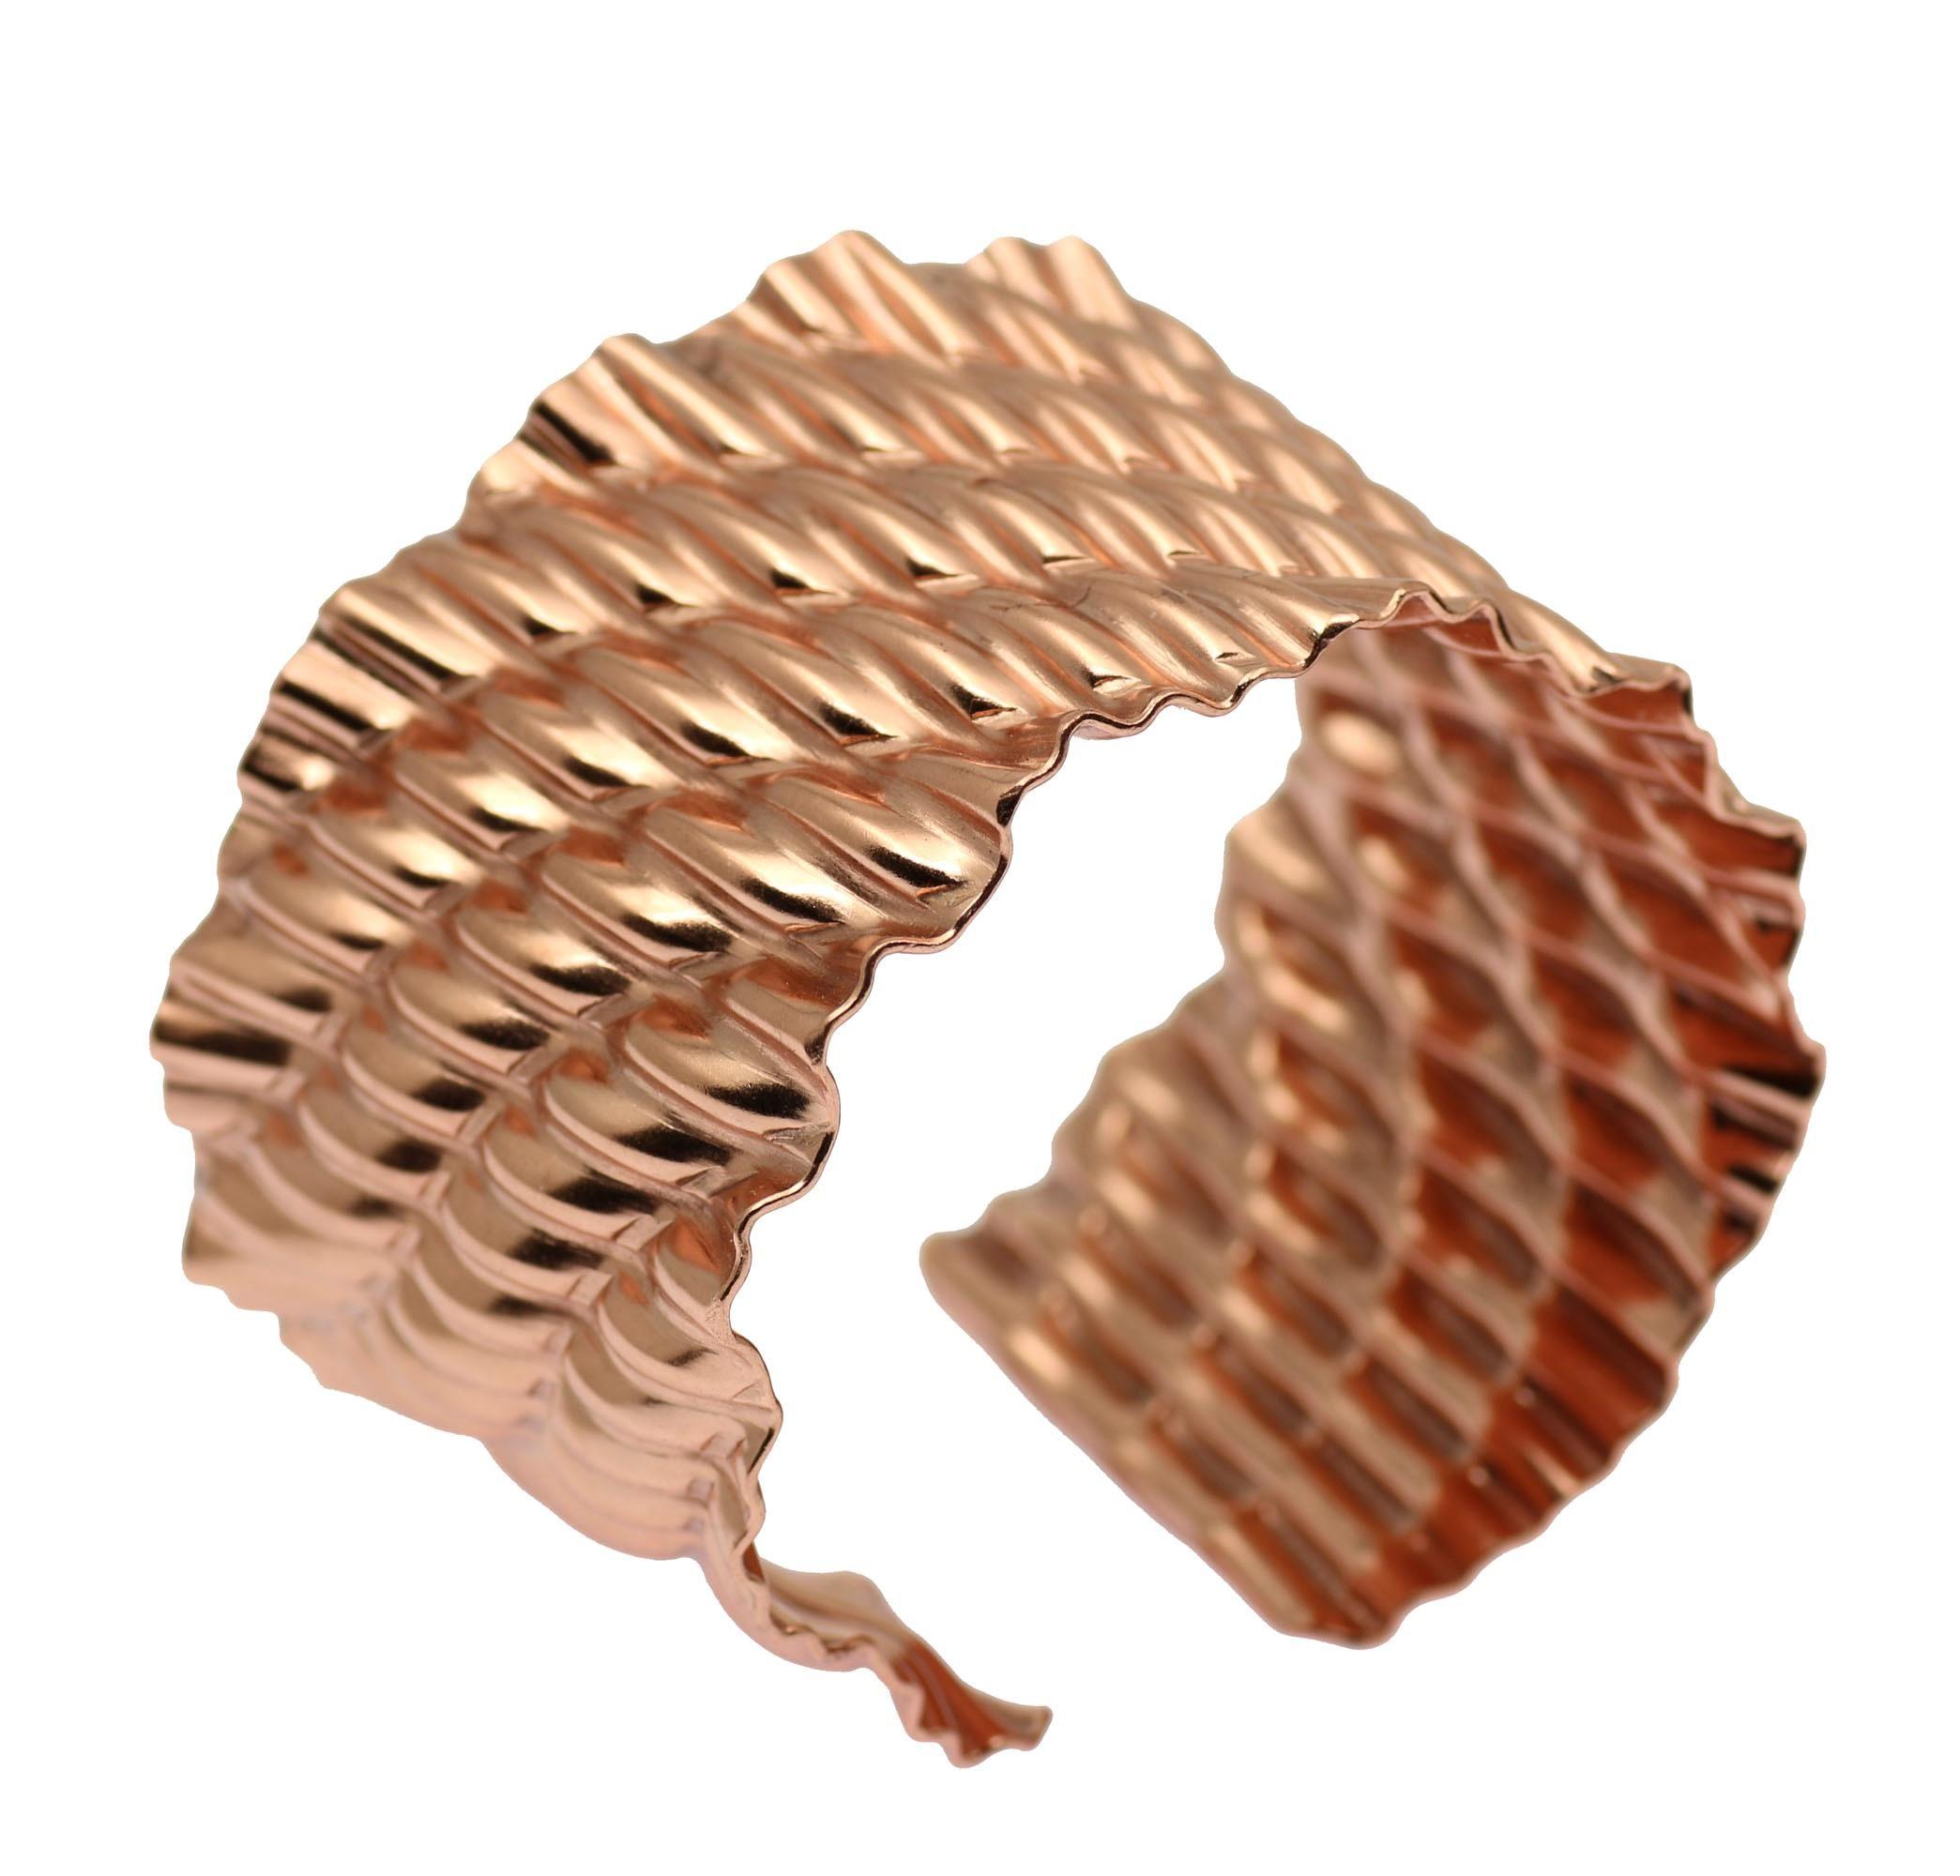 27% OFF! Fashionable Corrugated Wave Rose Gold Tone Cuff Bracelet Highlighted on #AmazonPrime #FreeShipping http://www.amazon.com/dp/B01B6T2SE4